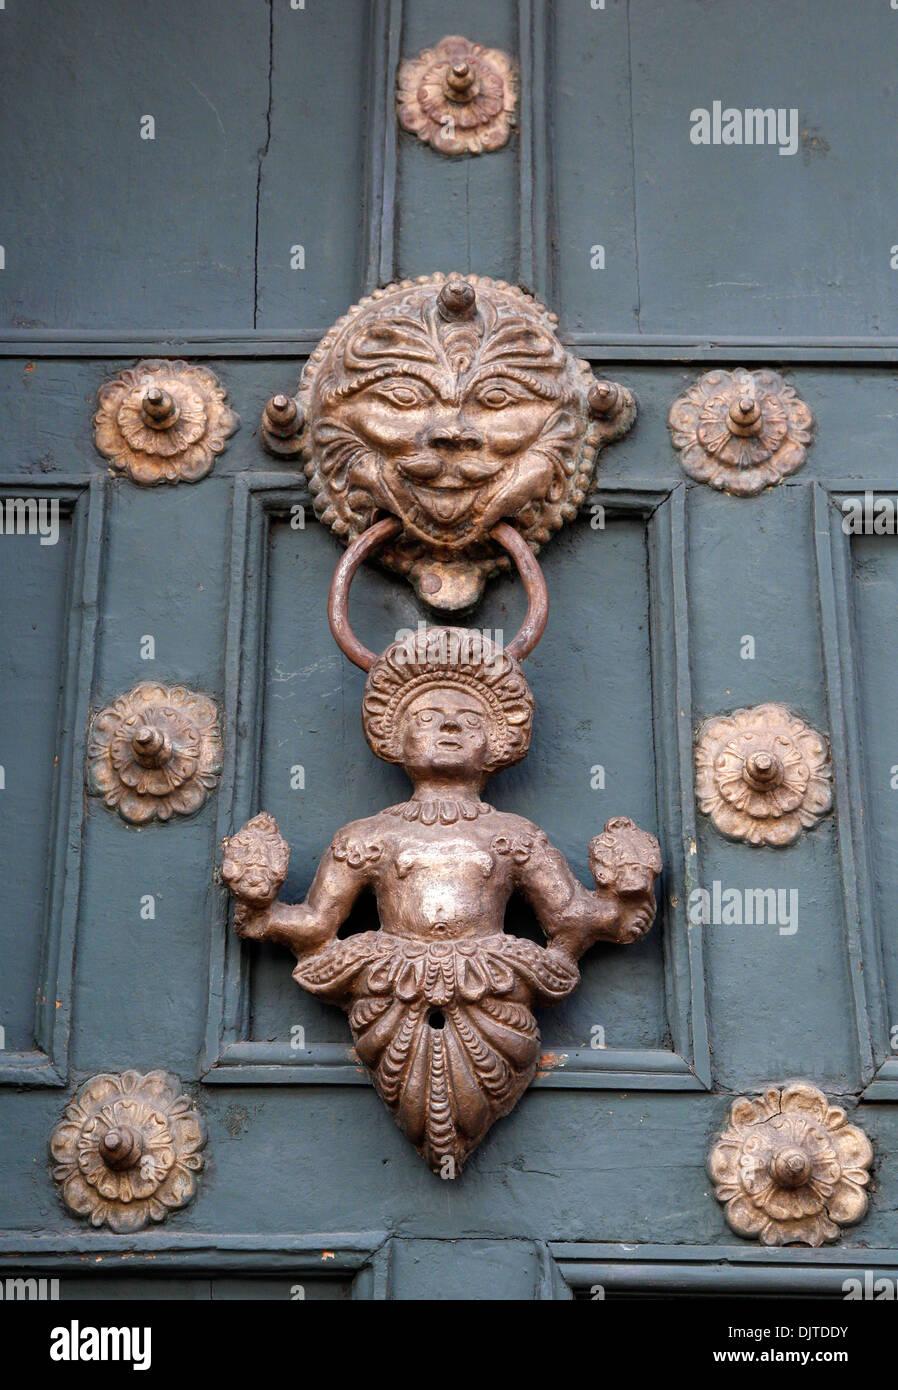 Detail of the entrance door to Machu Picchu museum / Casa Concha, Cuzco, Peru. - Stock Image